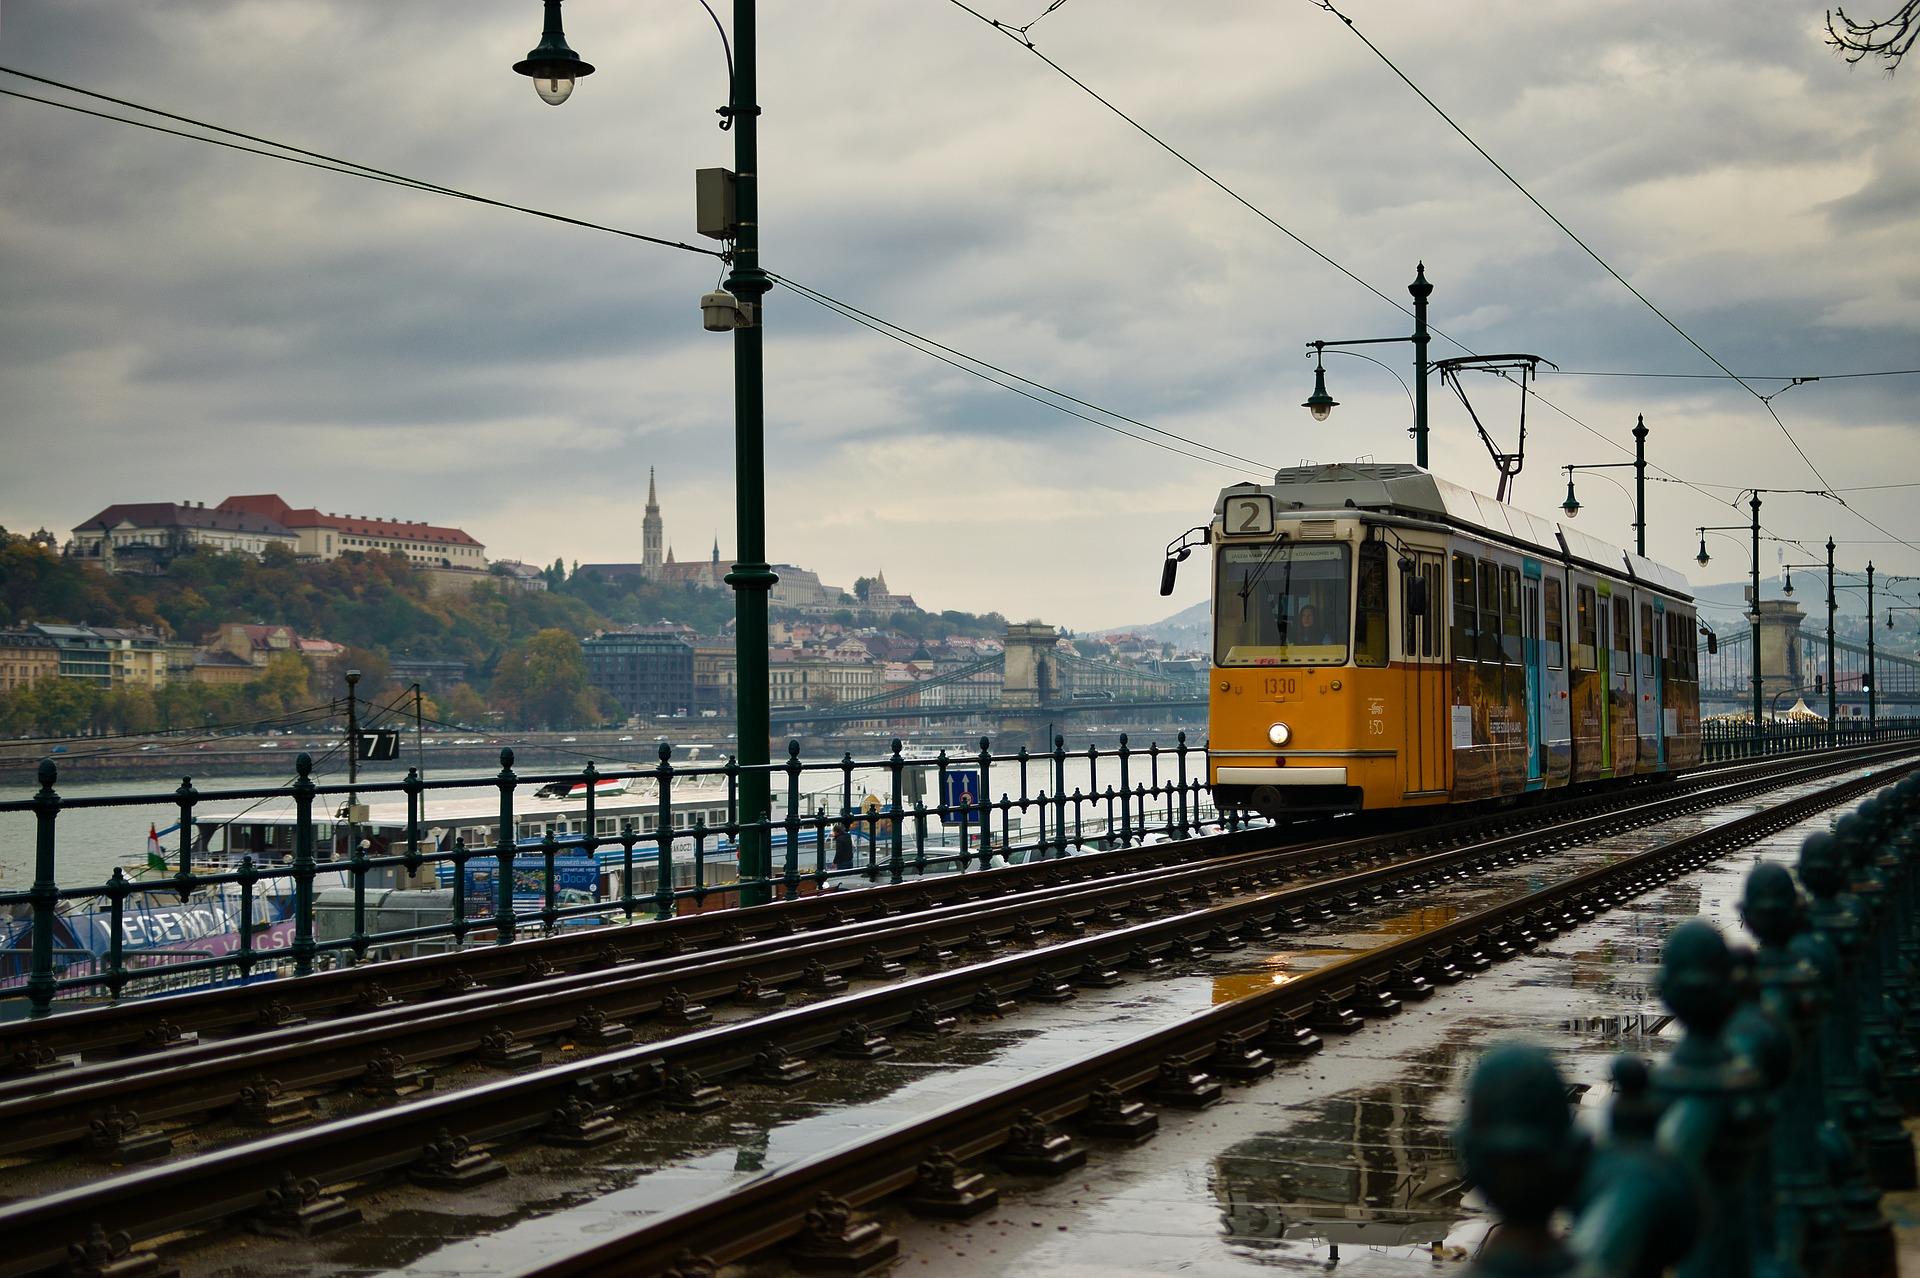 budapest-3930889_1920.jpg